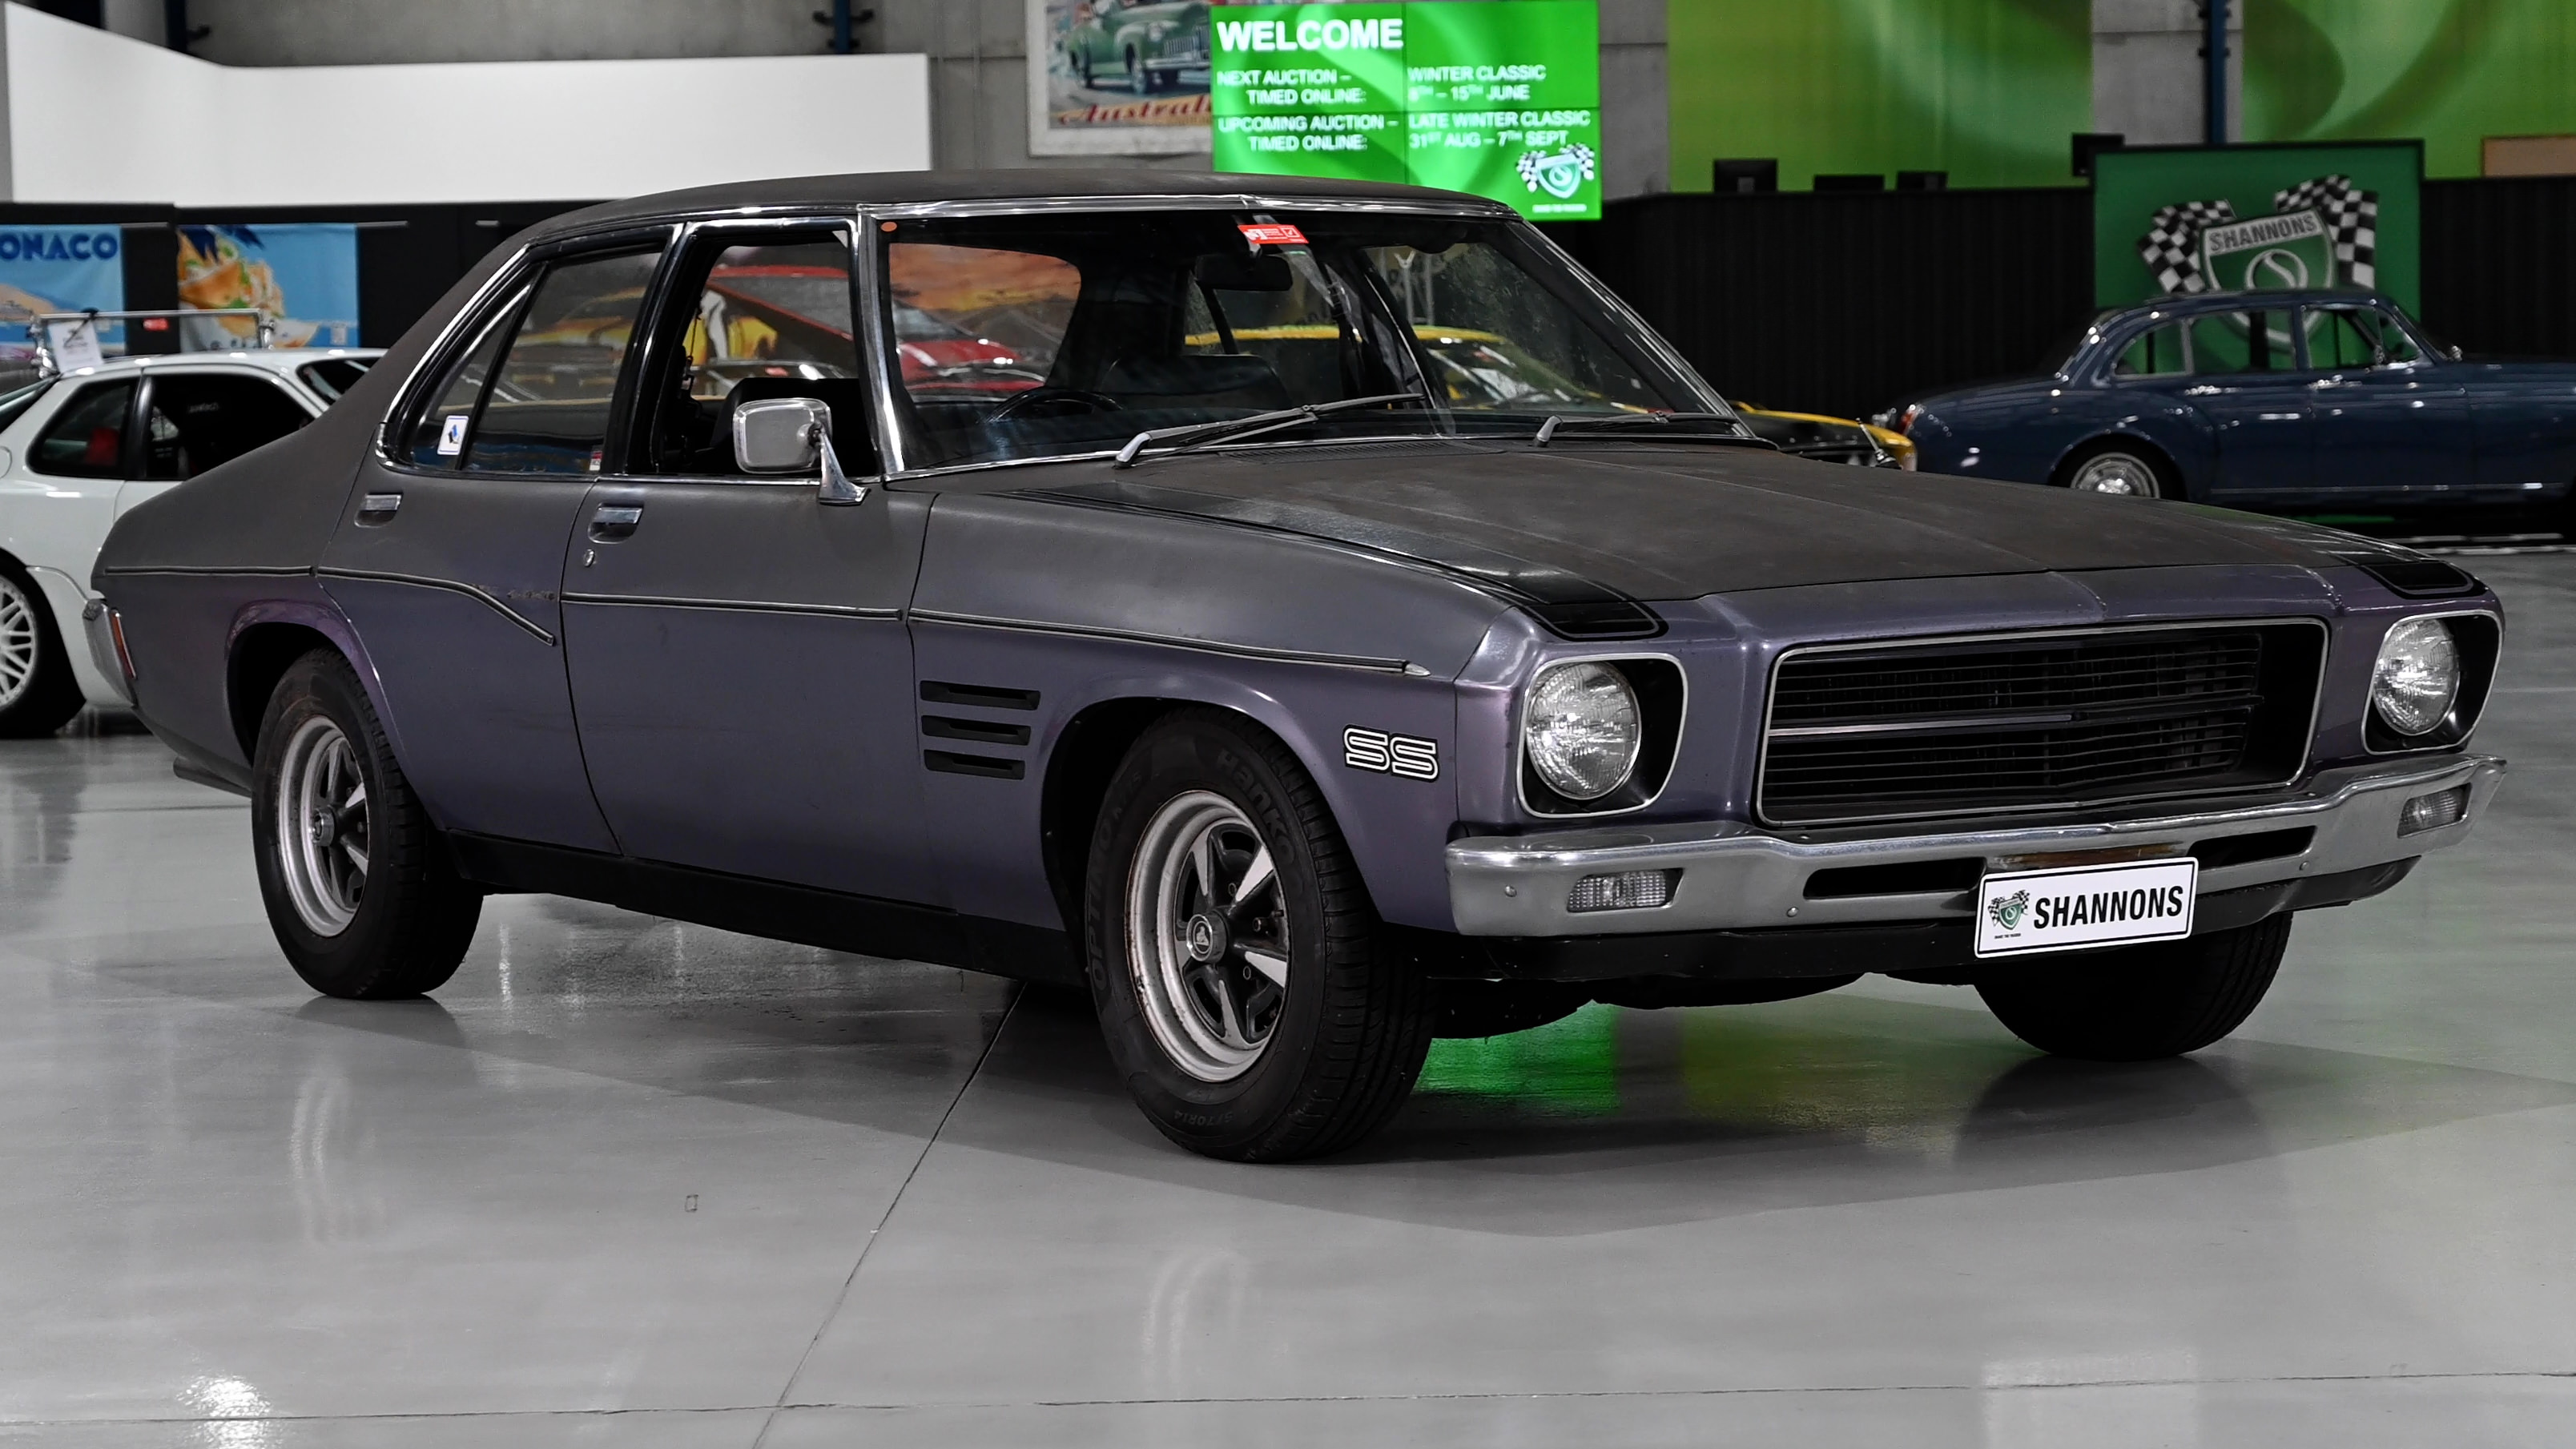 1972 Holden HQ SS 253 V8 Sedan (Barn find) - 2021 Shannons Winter Timed Online Auction